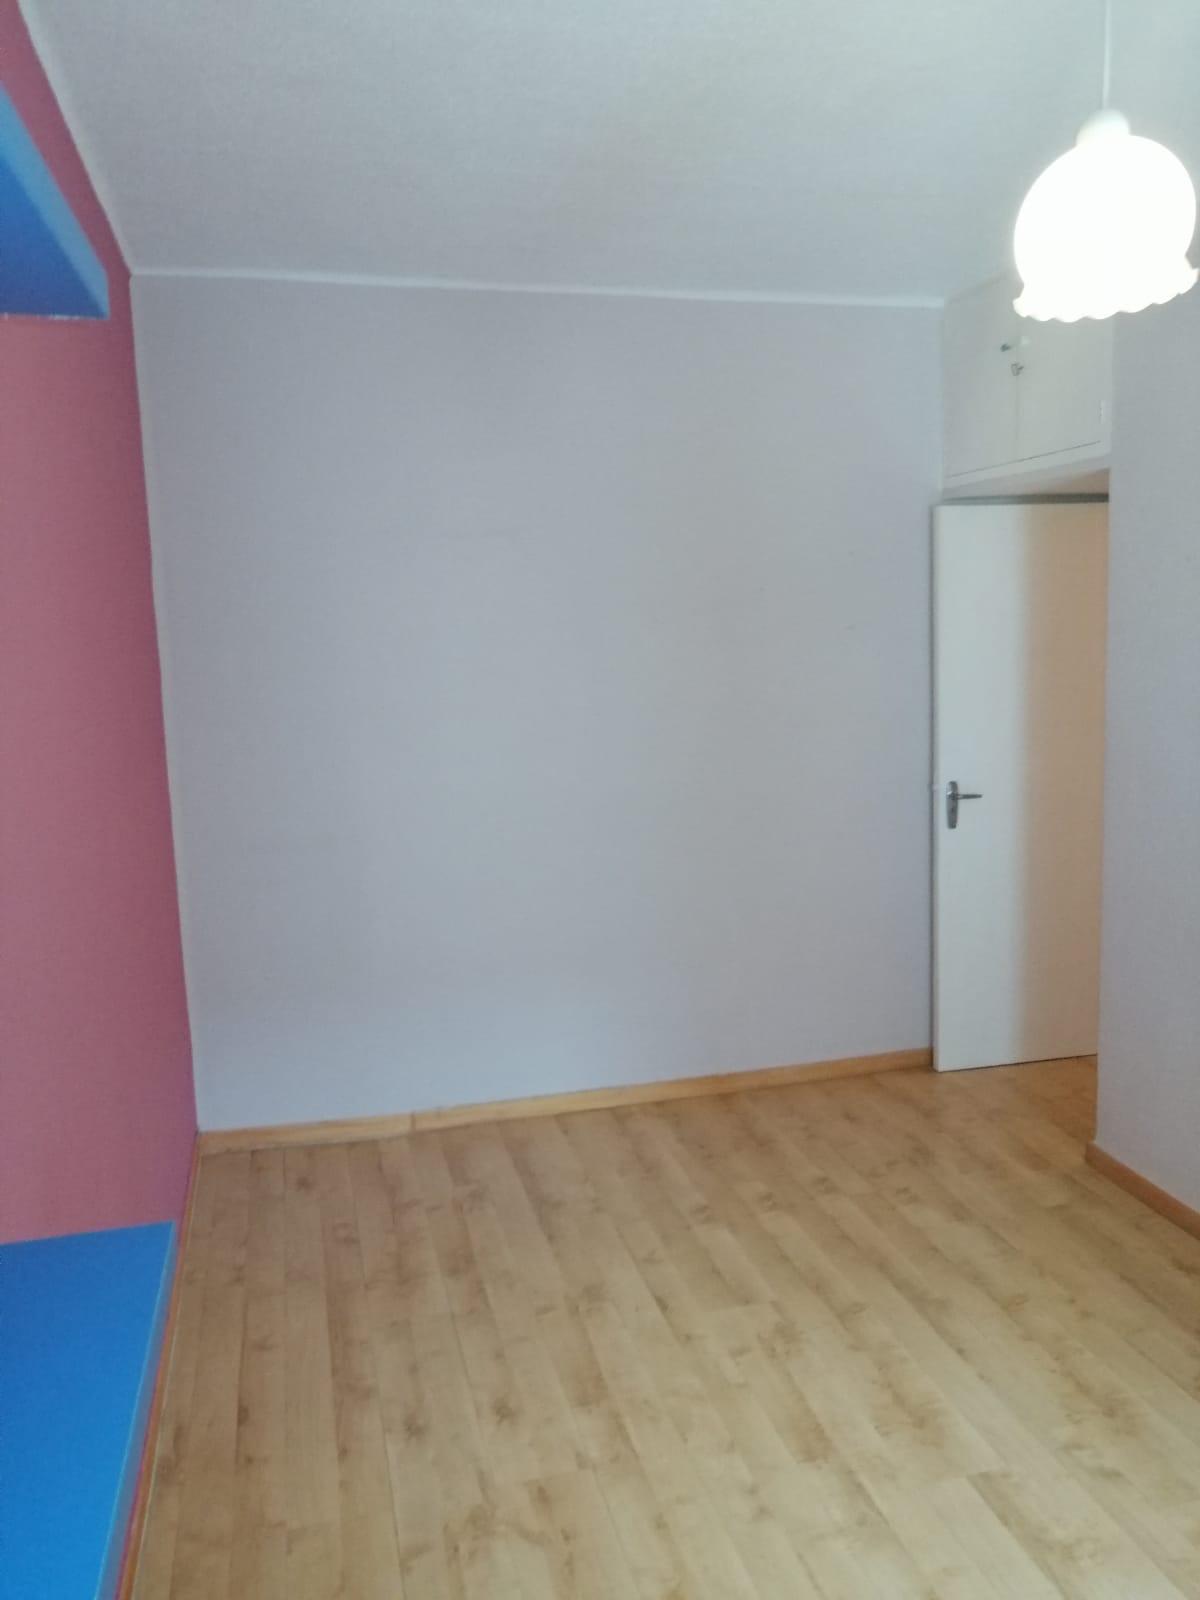 Piso de tres dormitorios junto a corte inglés (REF: 53) - foto 25 7e10d017-a365-48a8-878b-d20f048ce53e.jpg